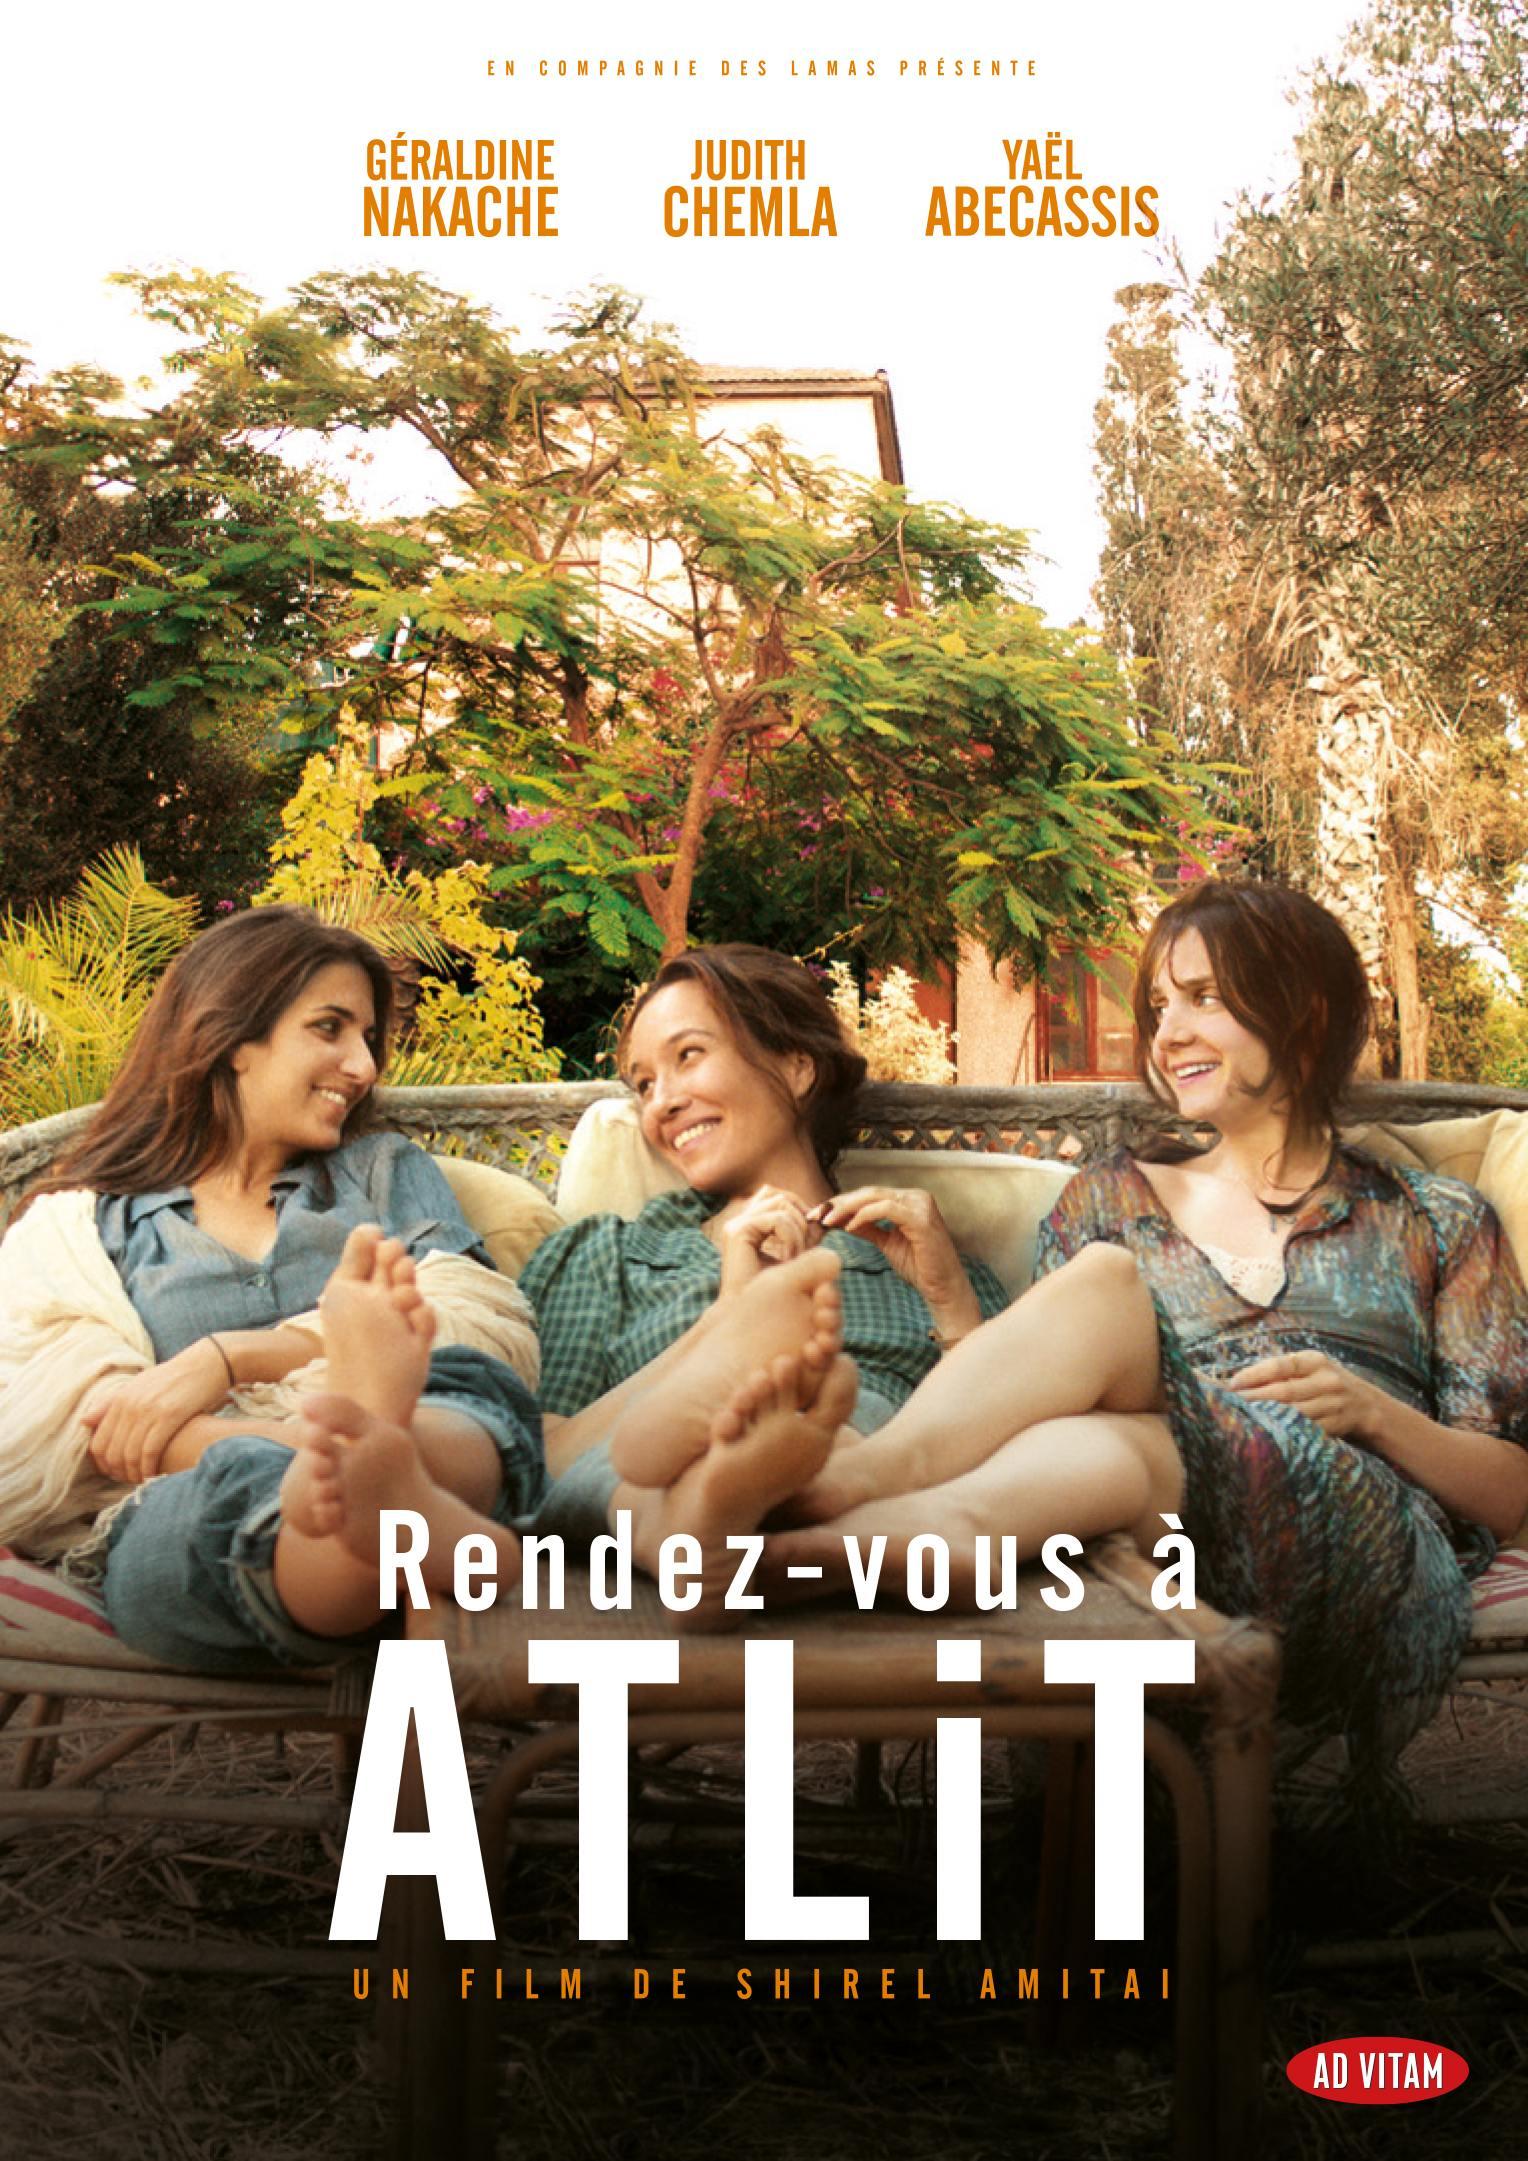 Atlit - dvd